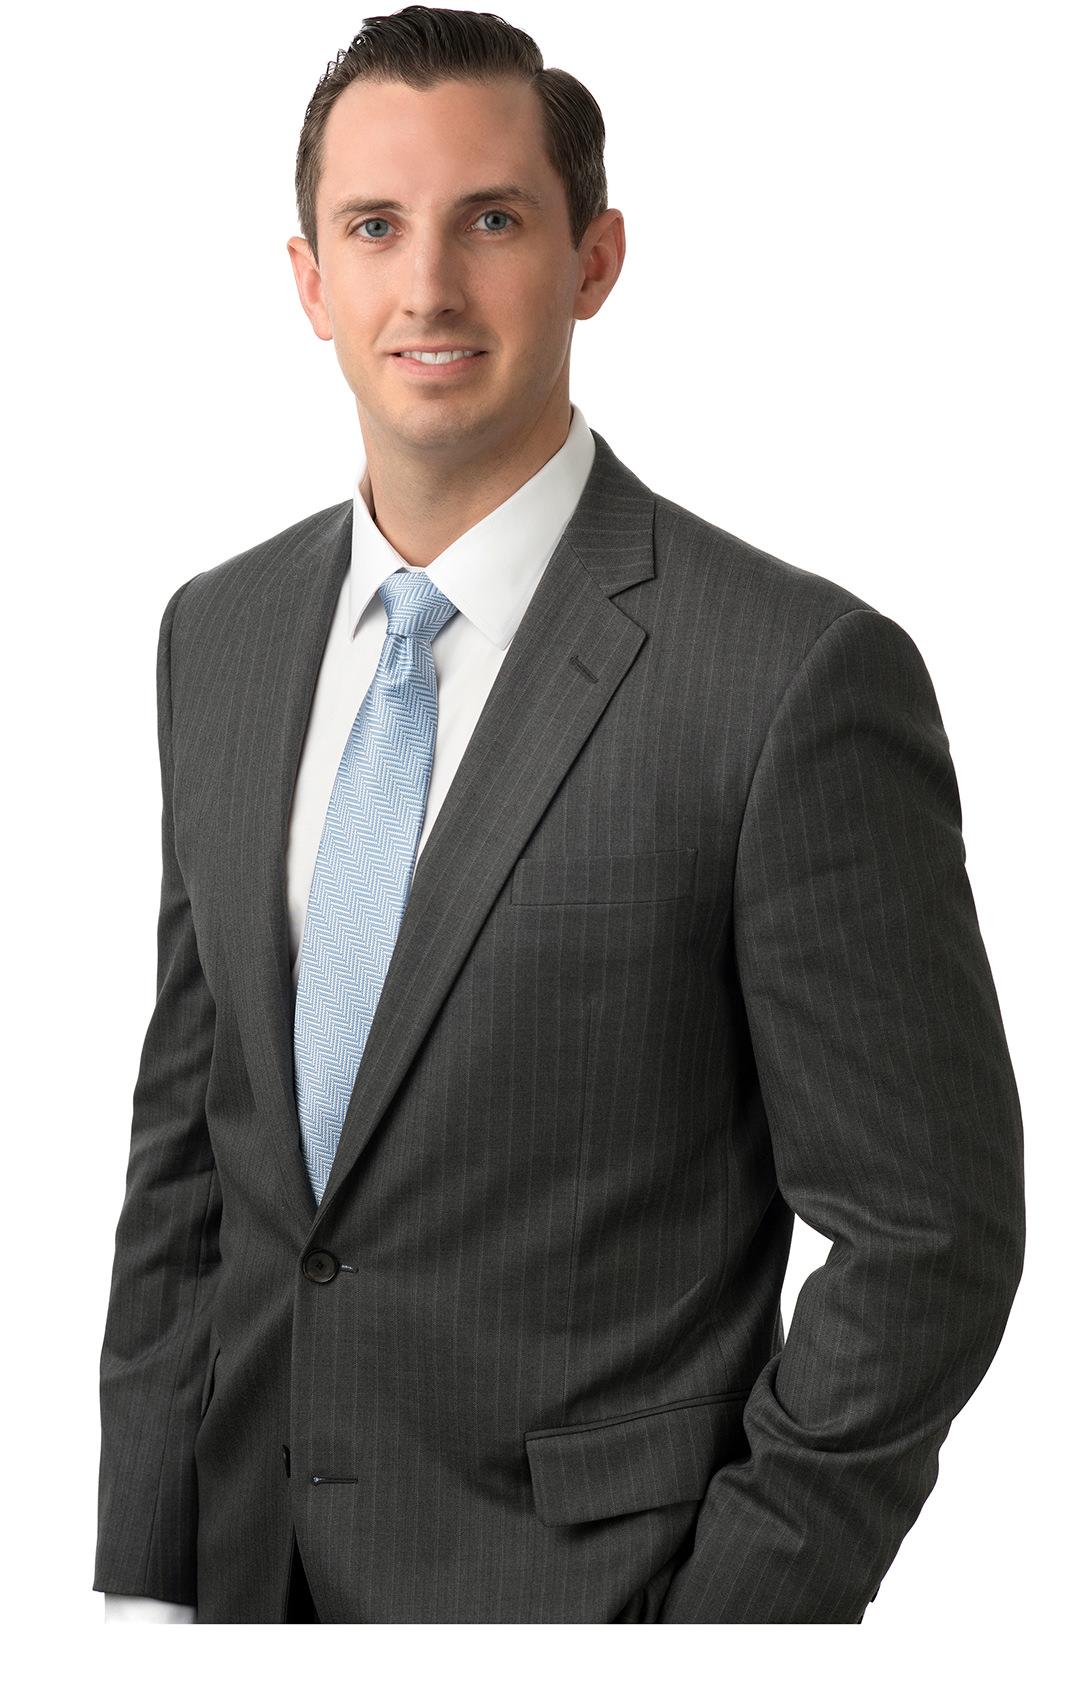 Andrew M. Connor